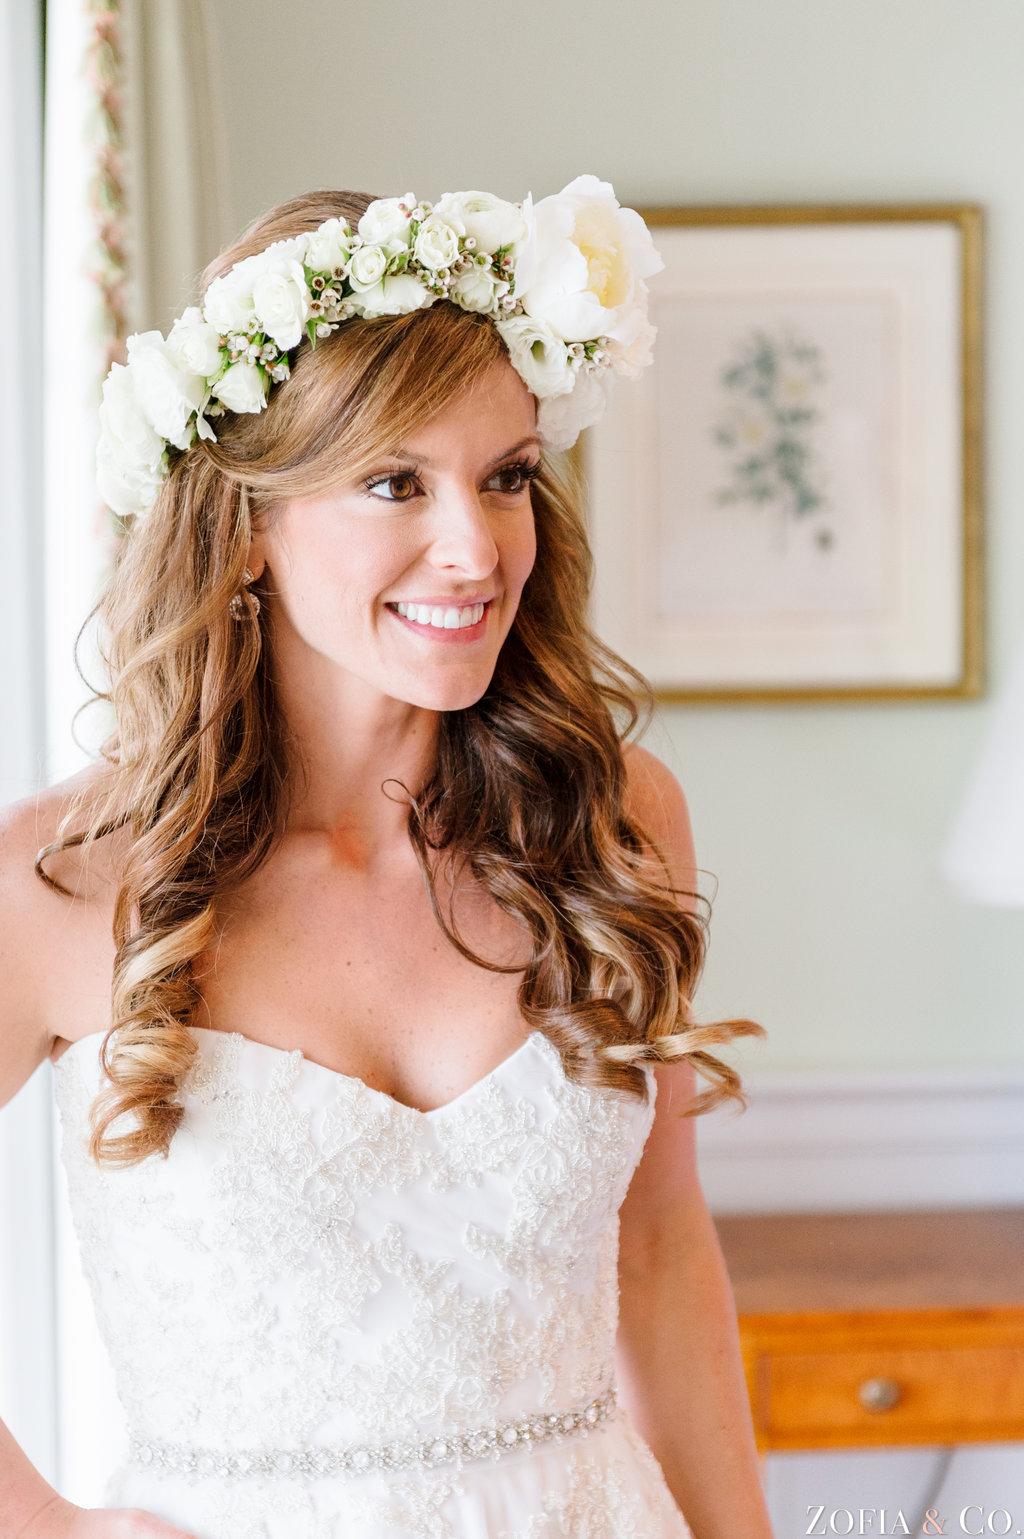 Ceci_New_York_Style_Luxury_Custom_Summer_Wedding_CeciBride_Nautical_Blue_Gold_Letterpress_Foil_28.jpg